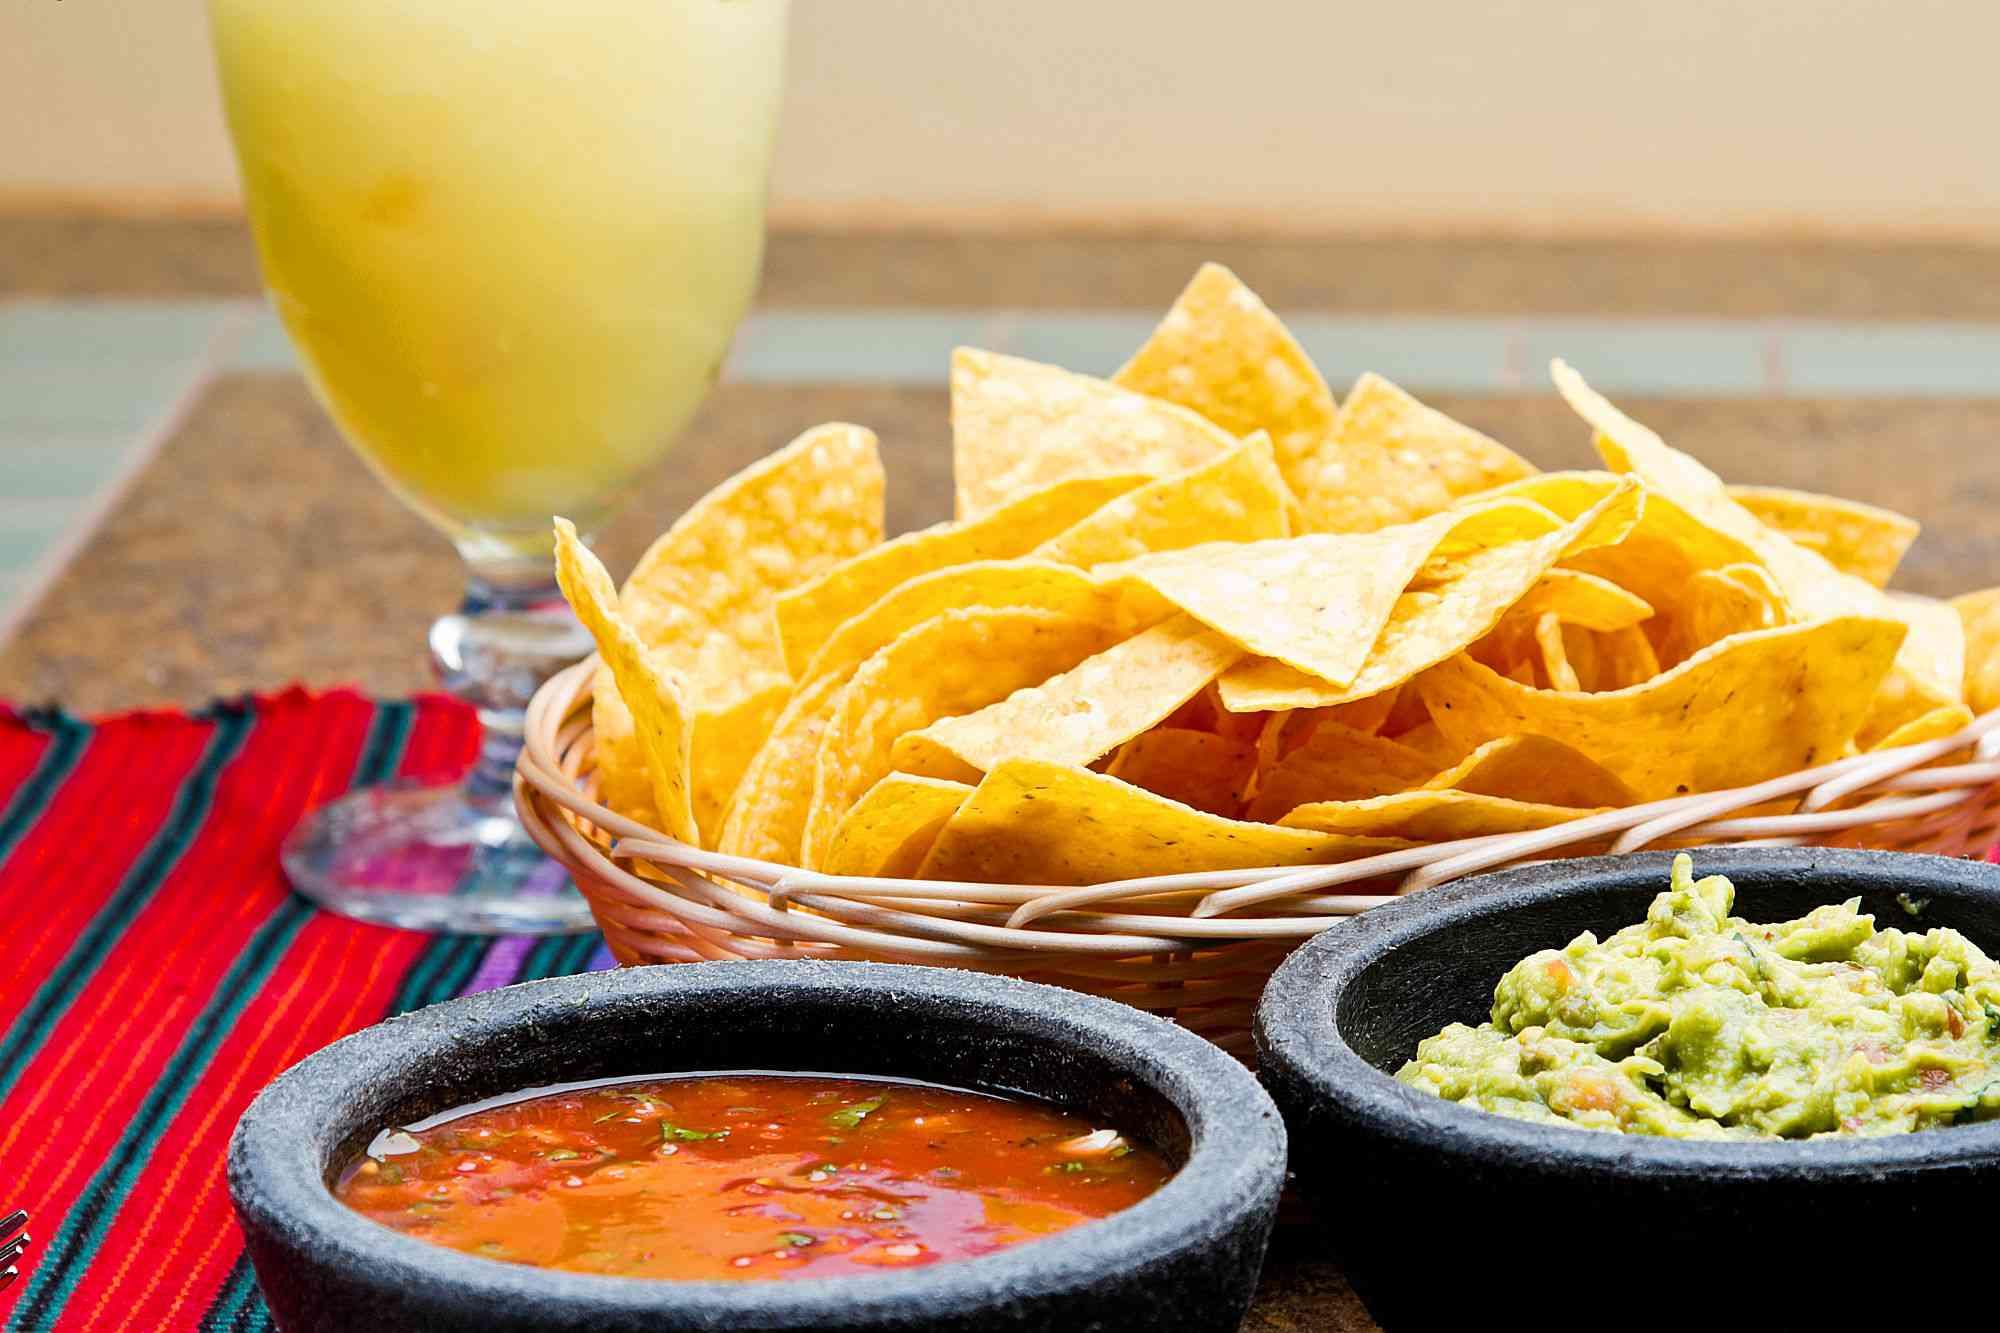 Chips, Salsa, Guacamole